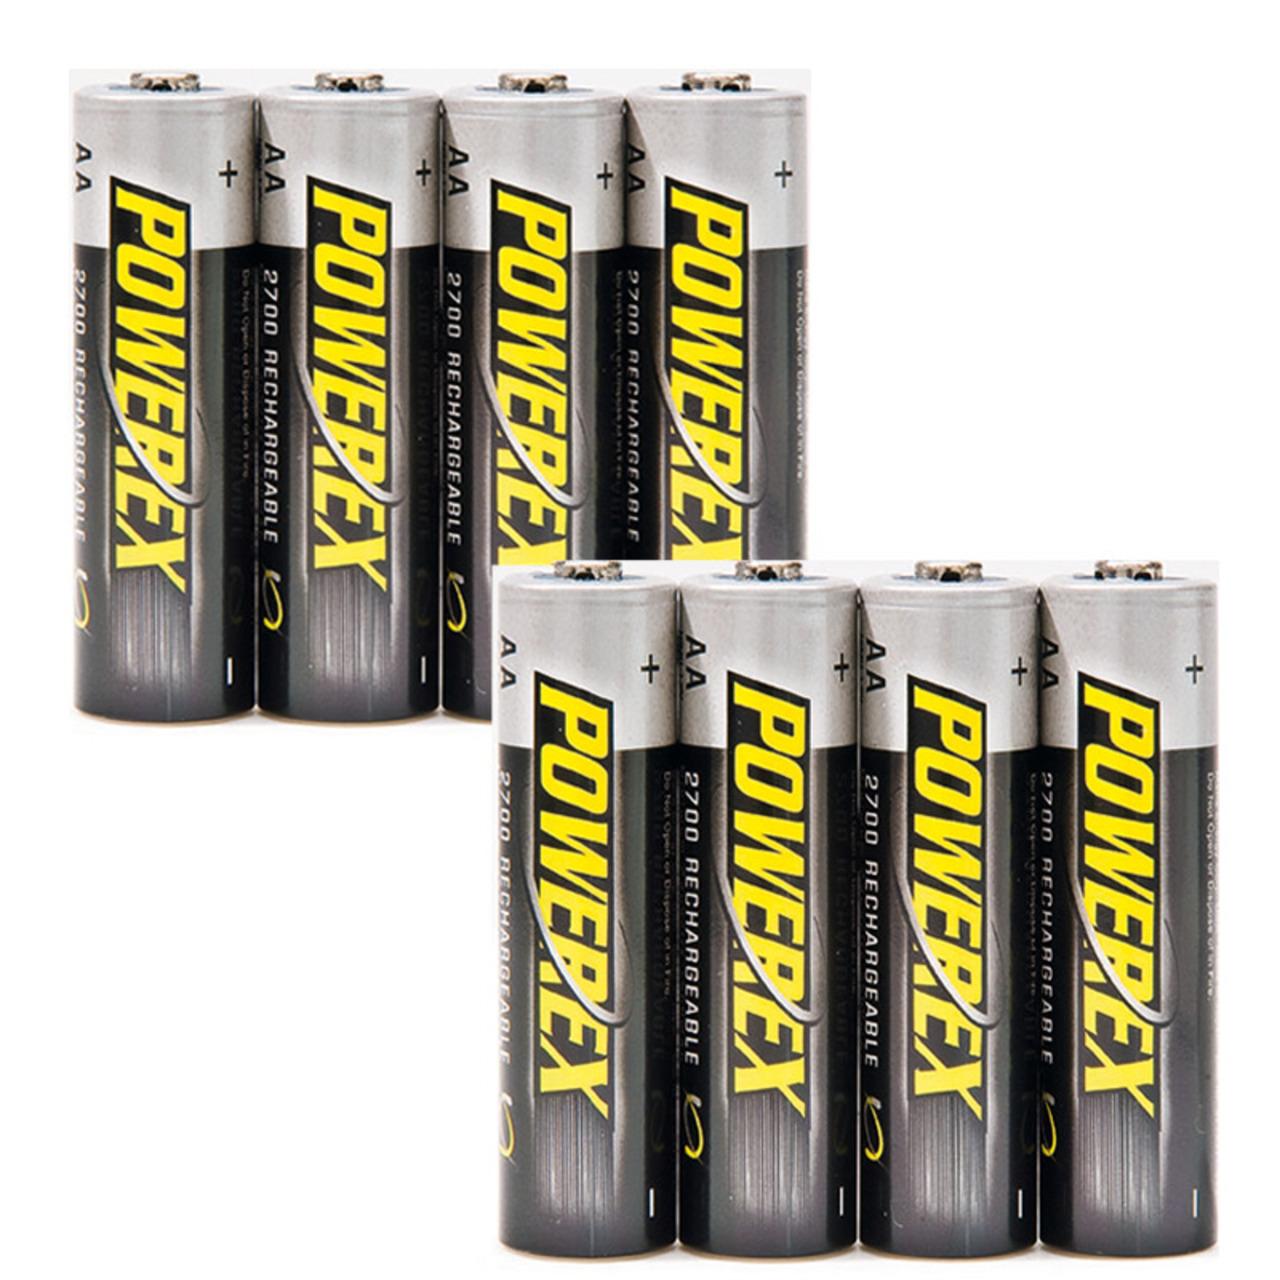 ELV Powerex-NiMH-Akku- Mignon AA 2700 mAh- 8er-Pack